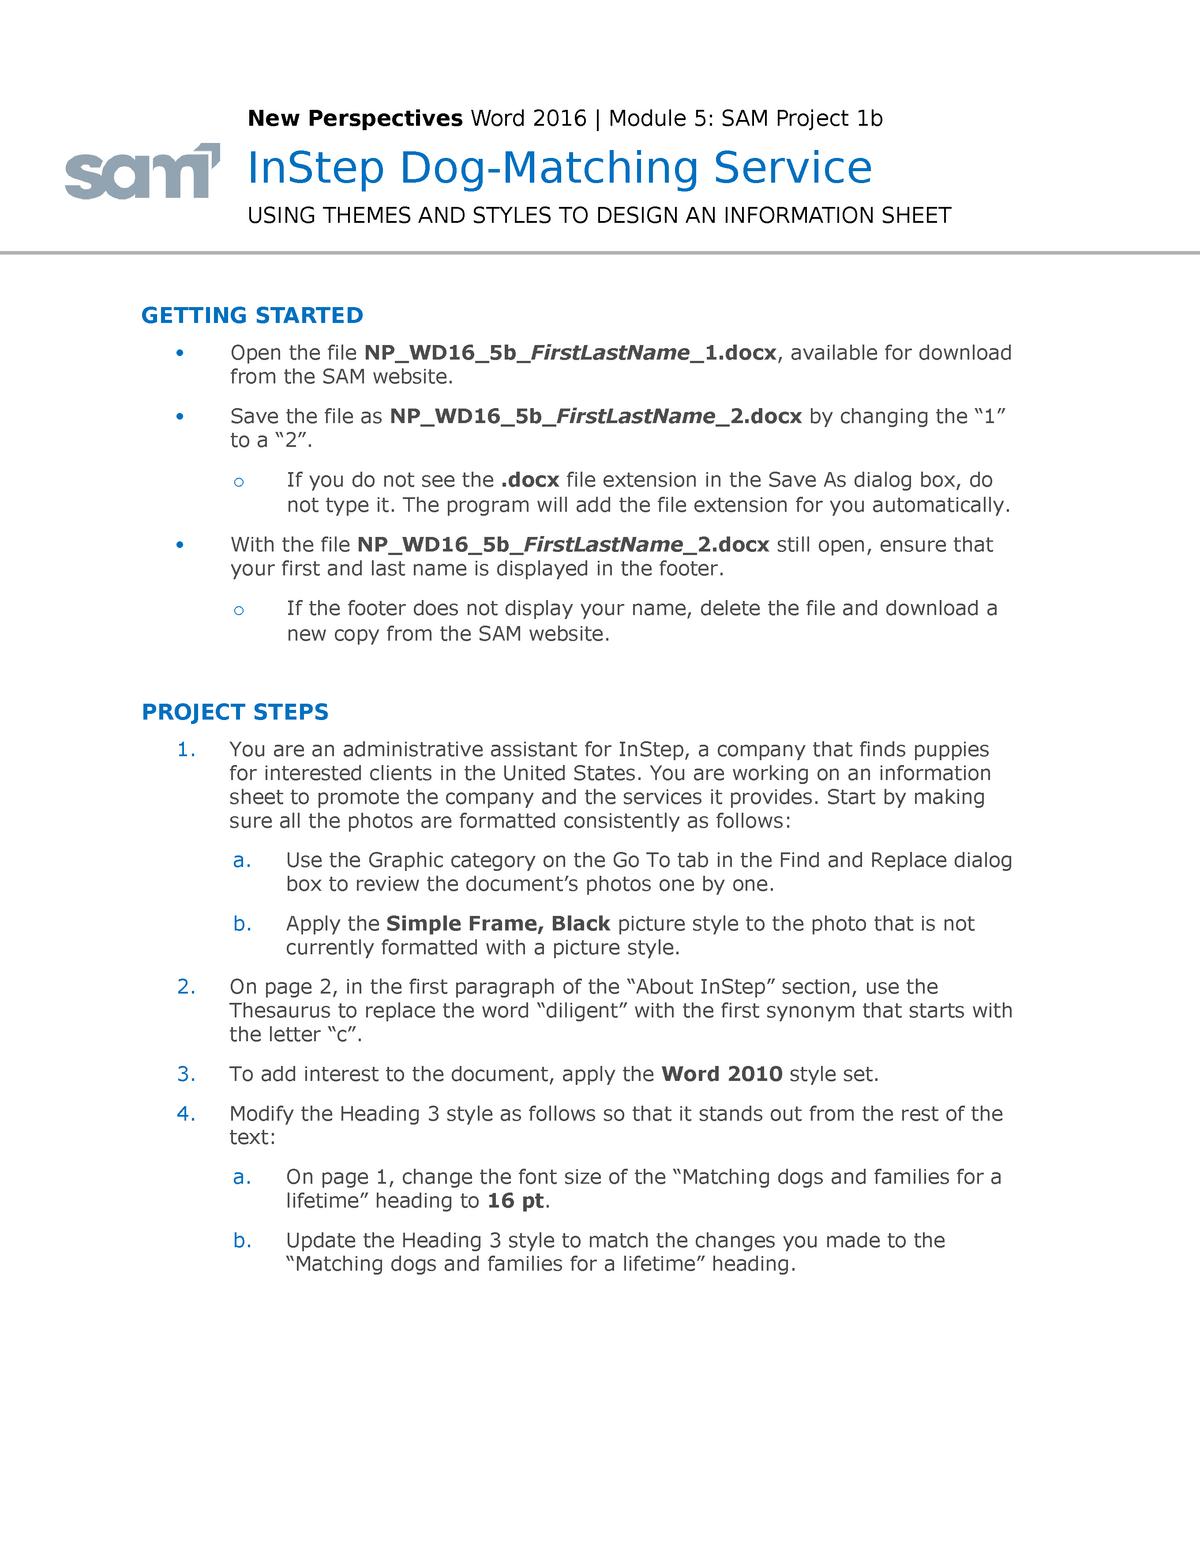 Instructions NP WD16 5b - HRMT16127: Business human